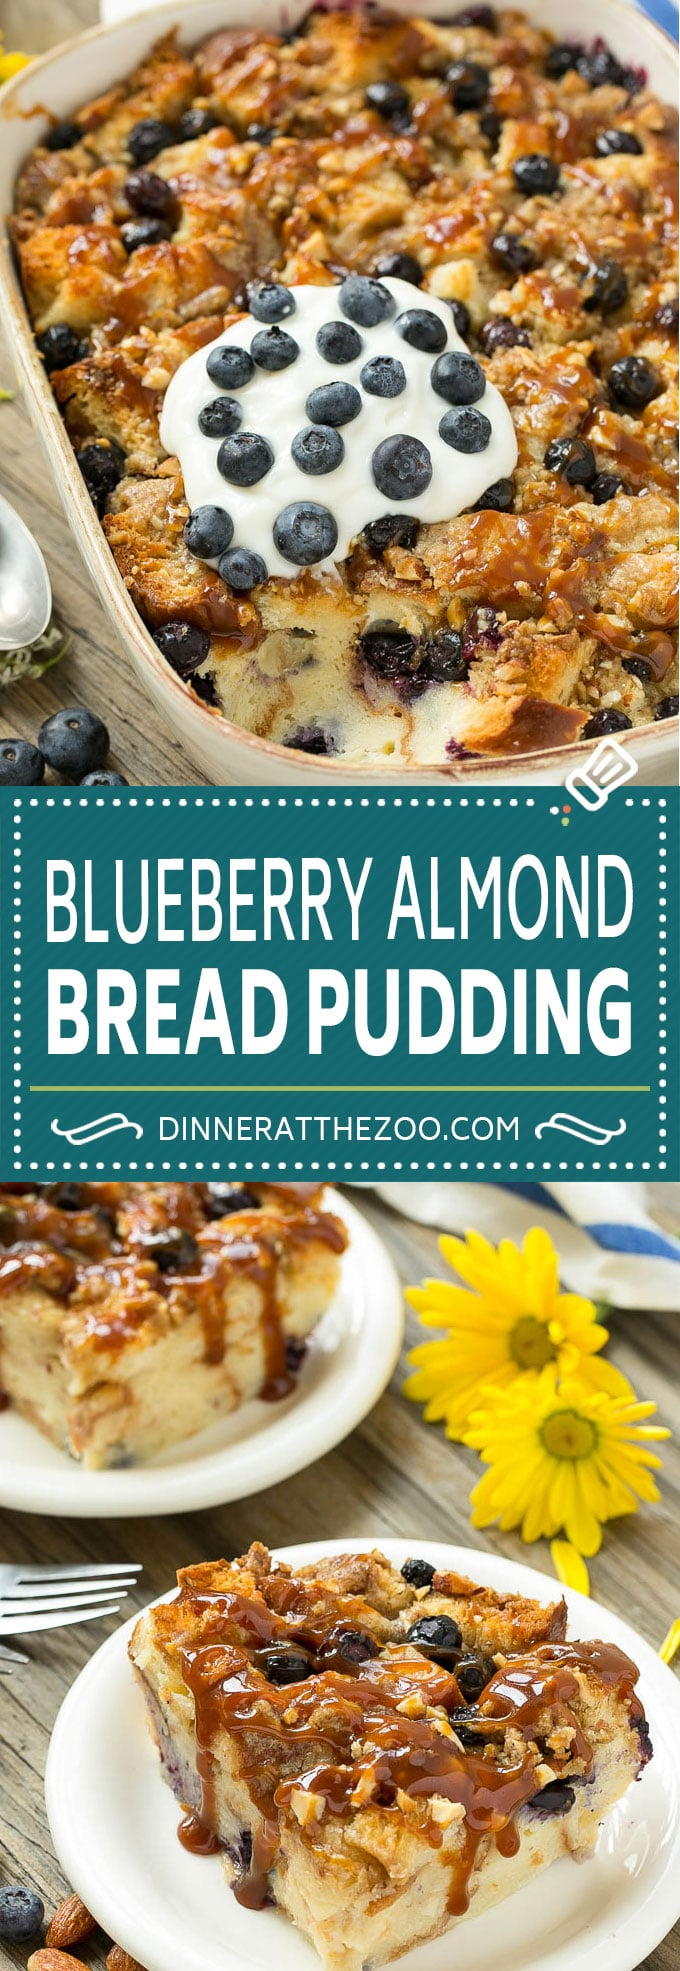 Blueberry Bread Pudding Recipe #dessert #blueberry #breadpudding #dinneratthezoo